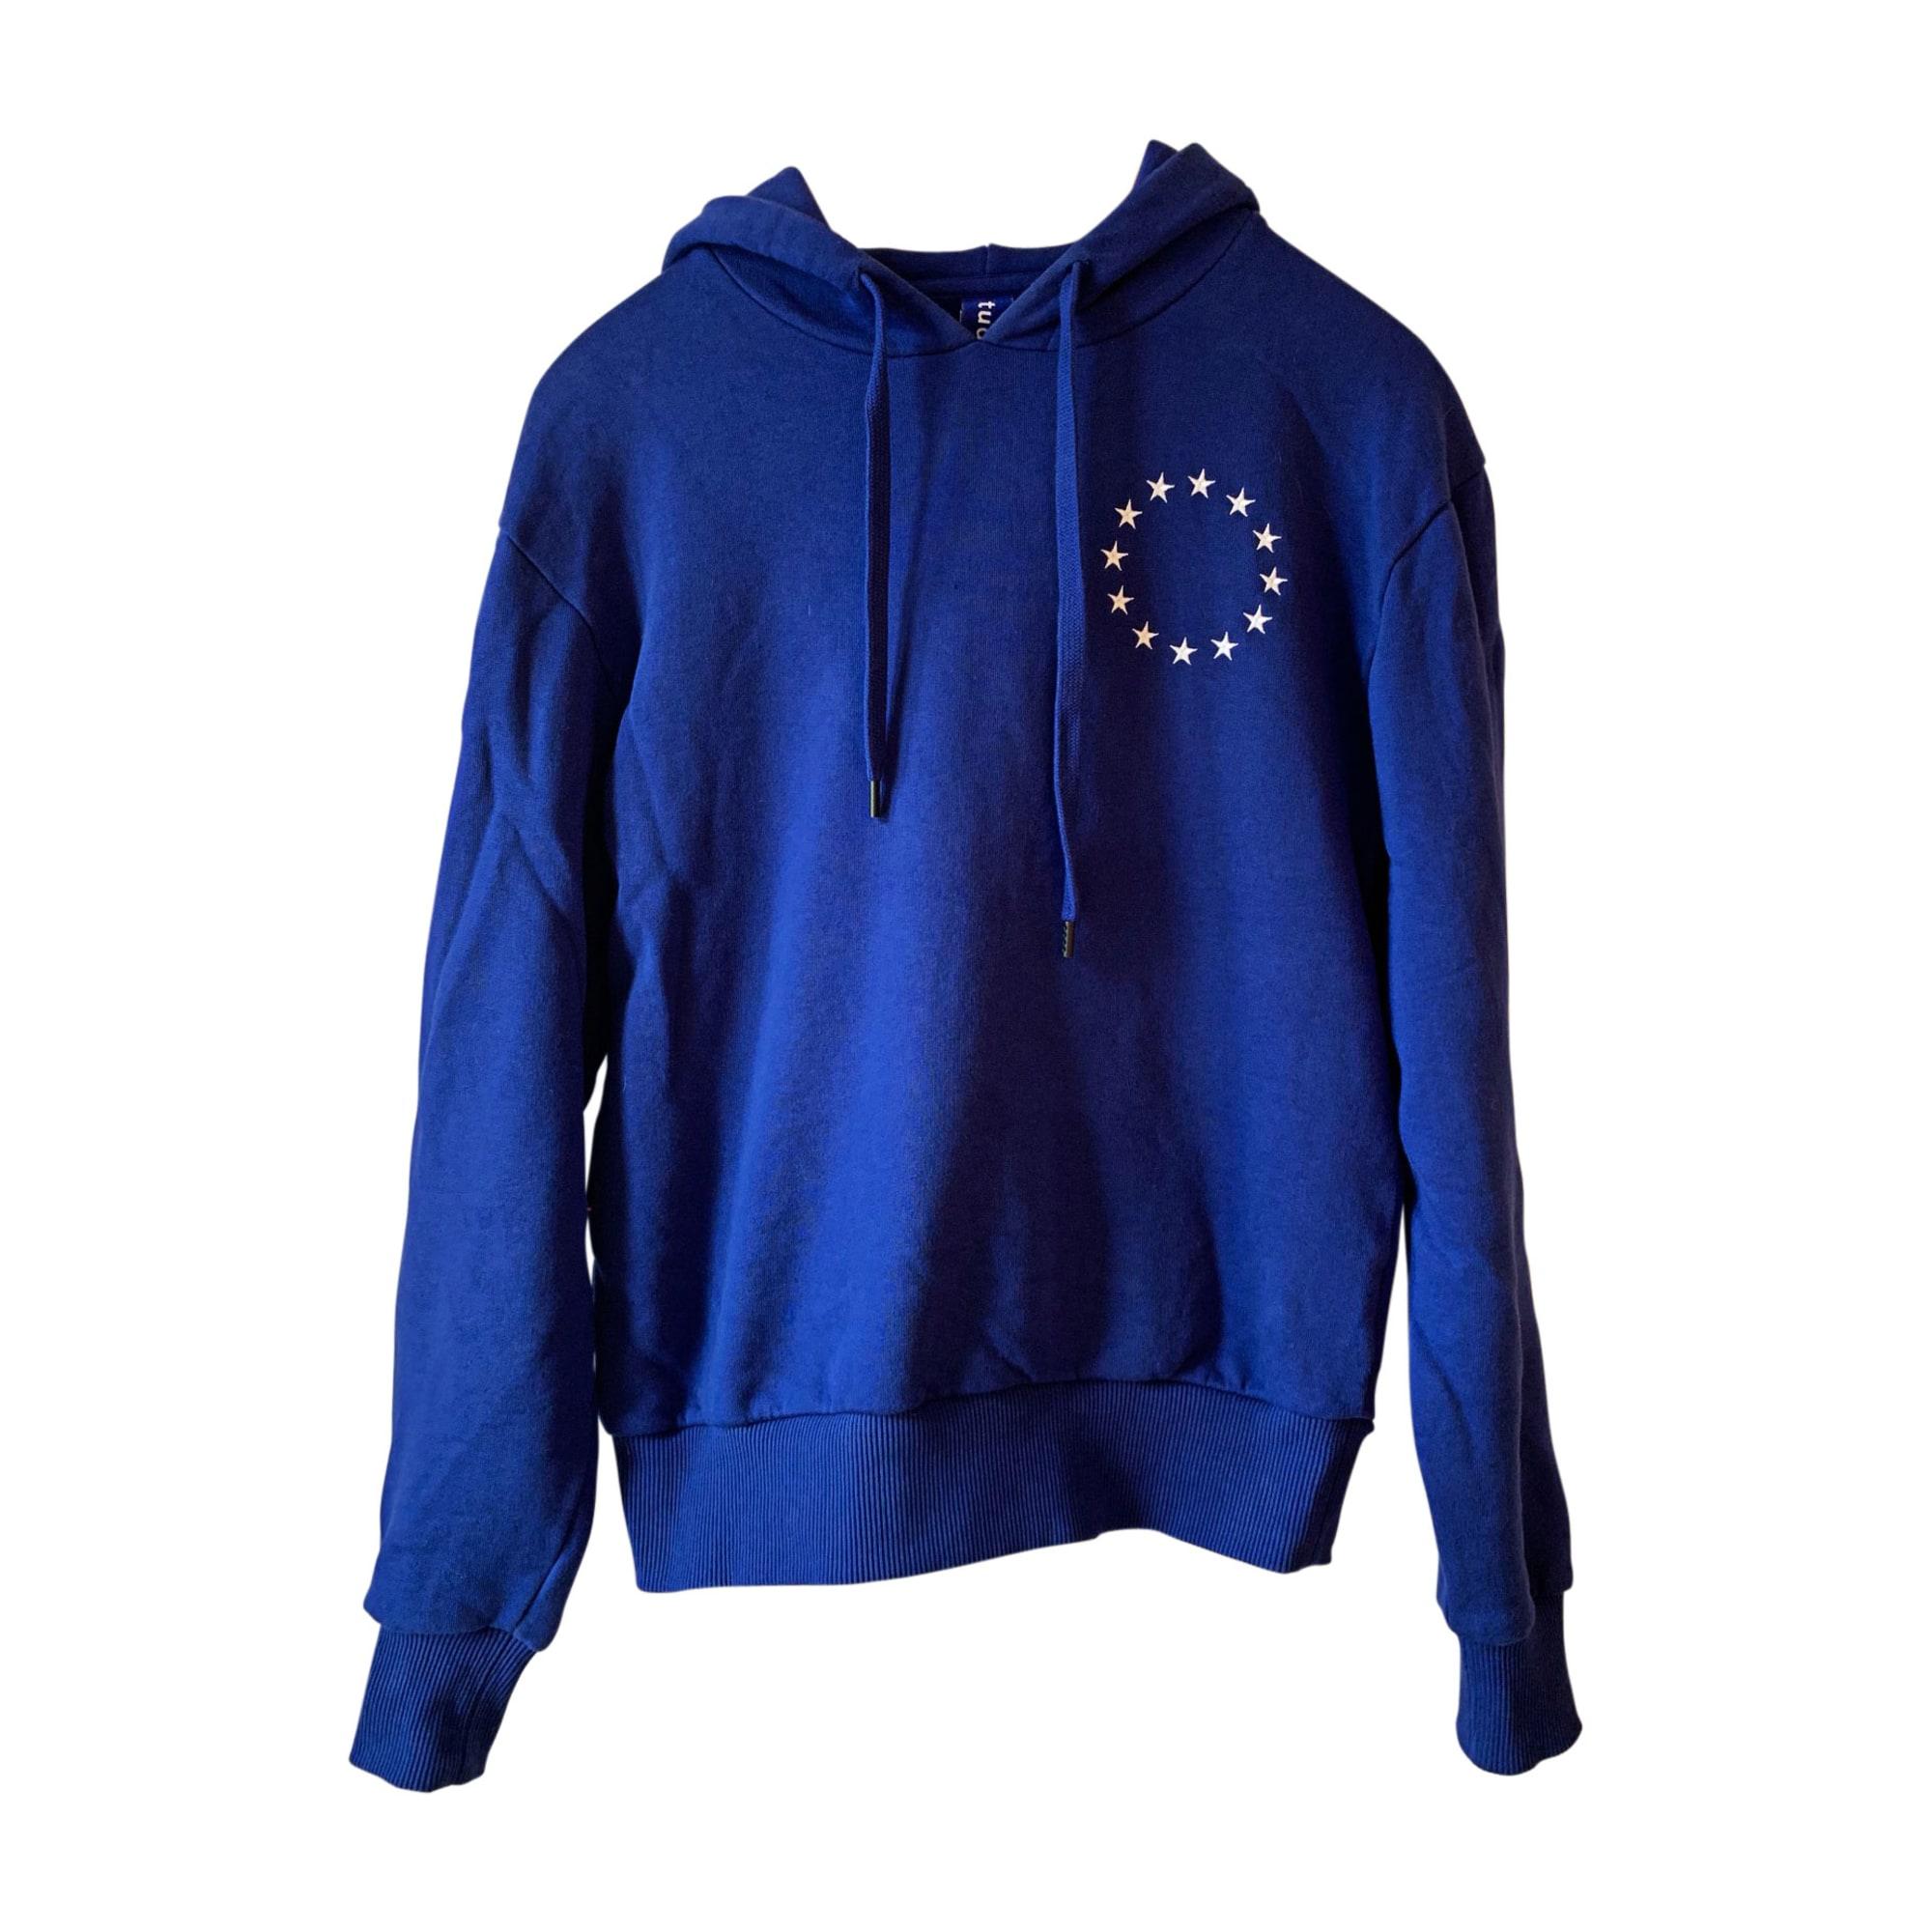 Sweatshirt ÉTUDES STUDIO Blue, navy, turquoise